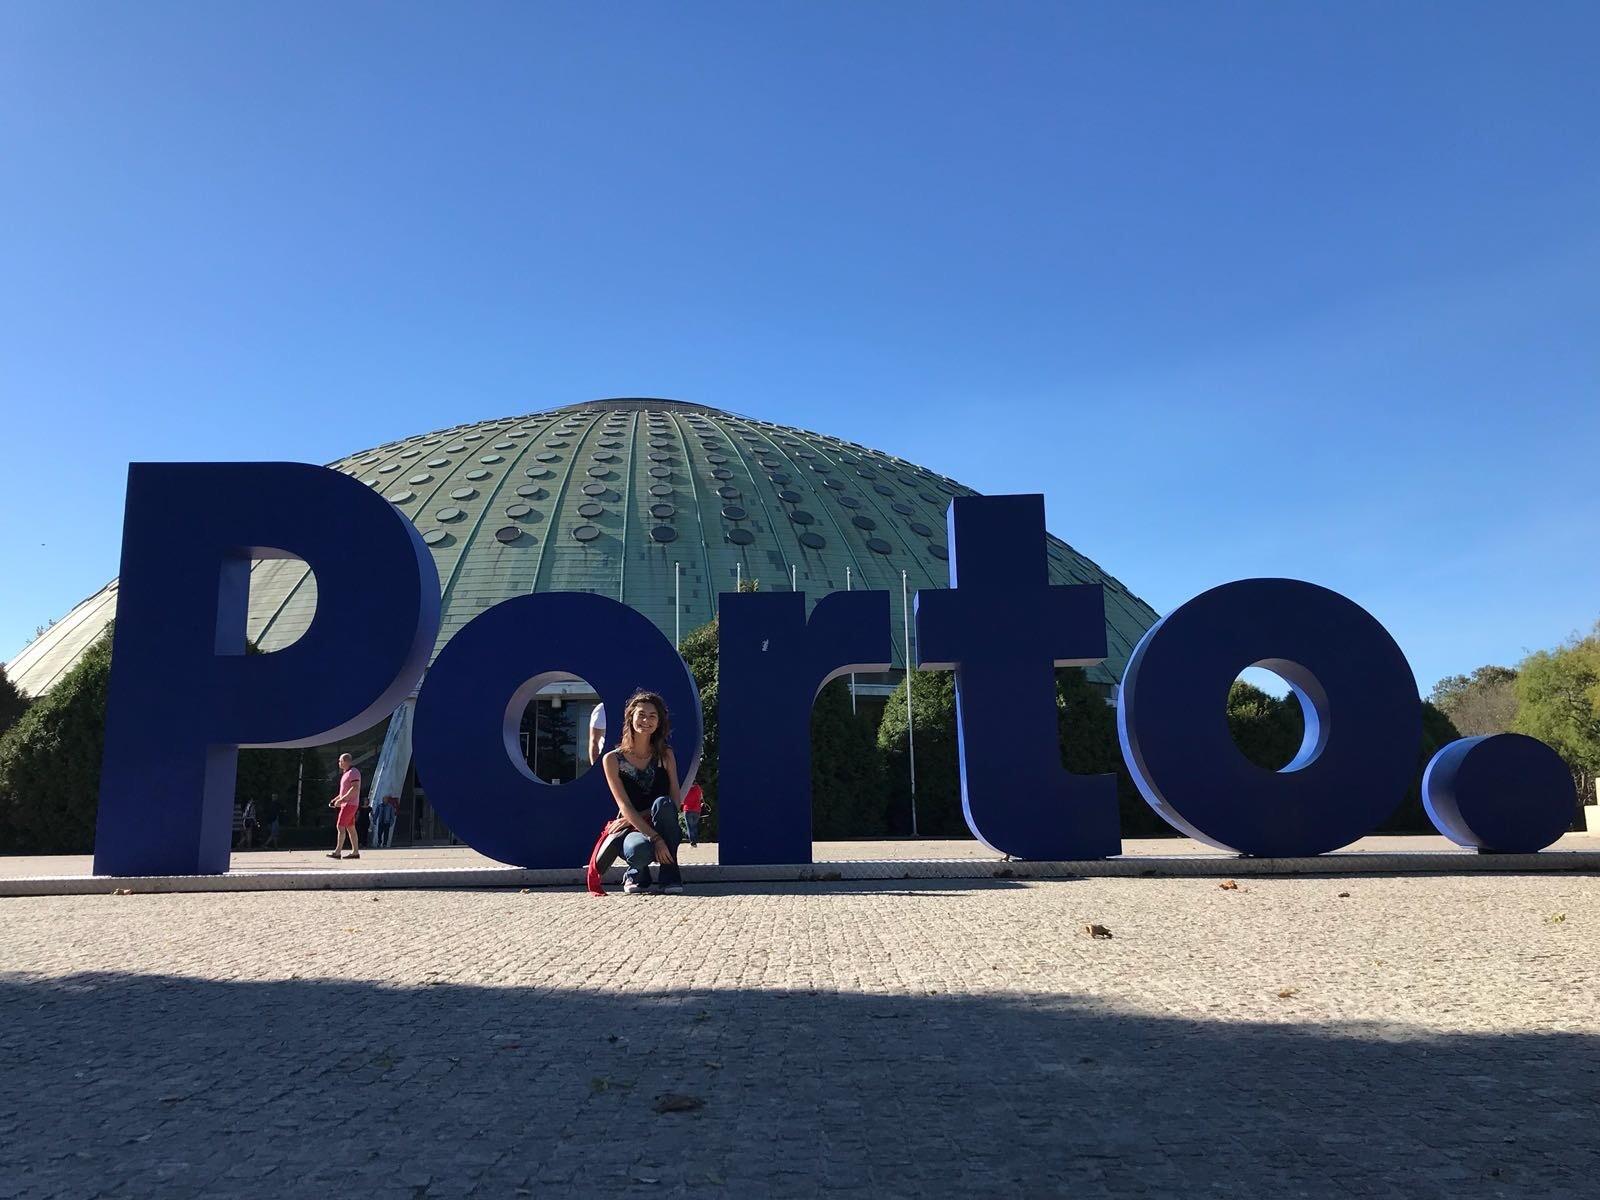 Porto sign